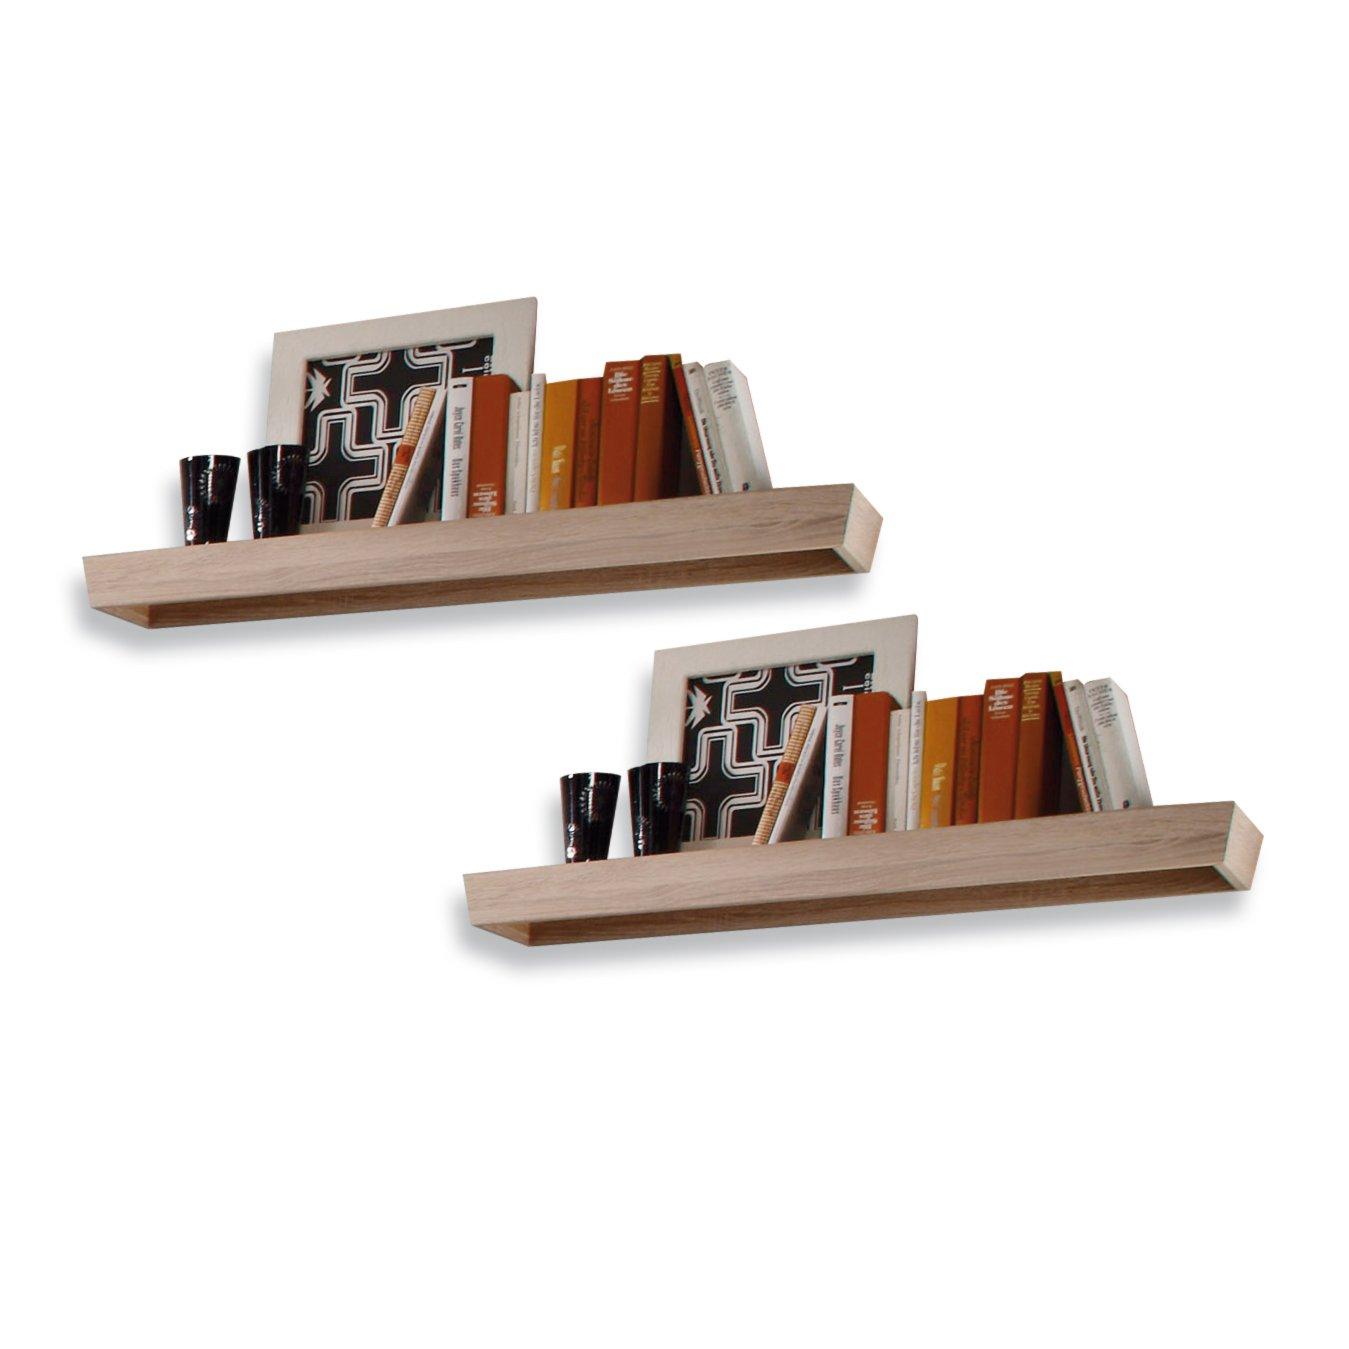 wandboard fernando 2er set eiche wohnwand fernando wohnwand elemente wohnw nde m bel. Black Bedroom Furniture Sets. Home Design Ideas